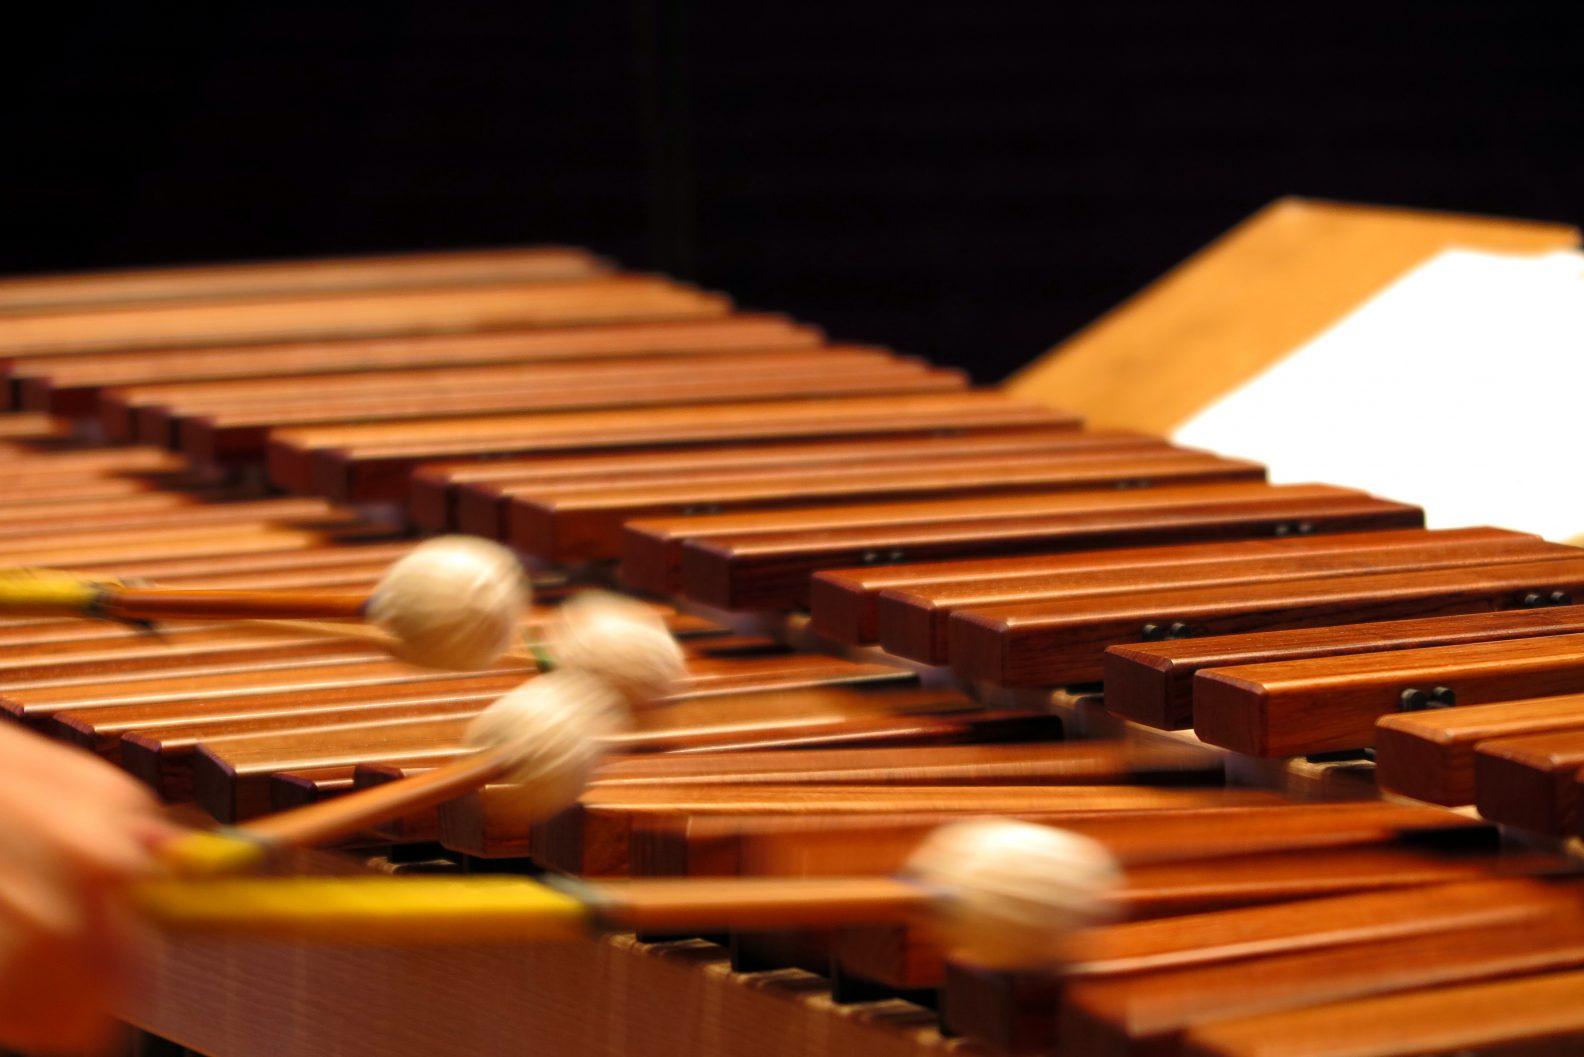 Evelyn Glennie Playing Marimba (7) at BBC Proms Chamber Music 4, Monday 10 November 2015, Cadogan Hall